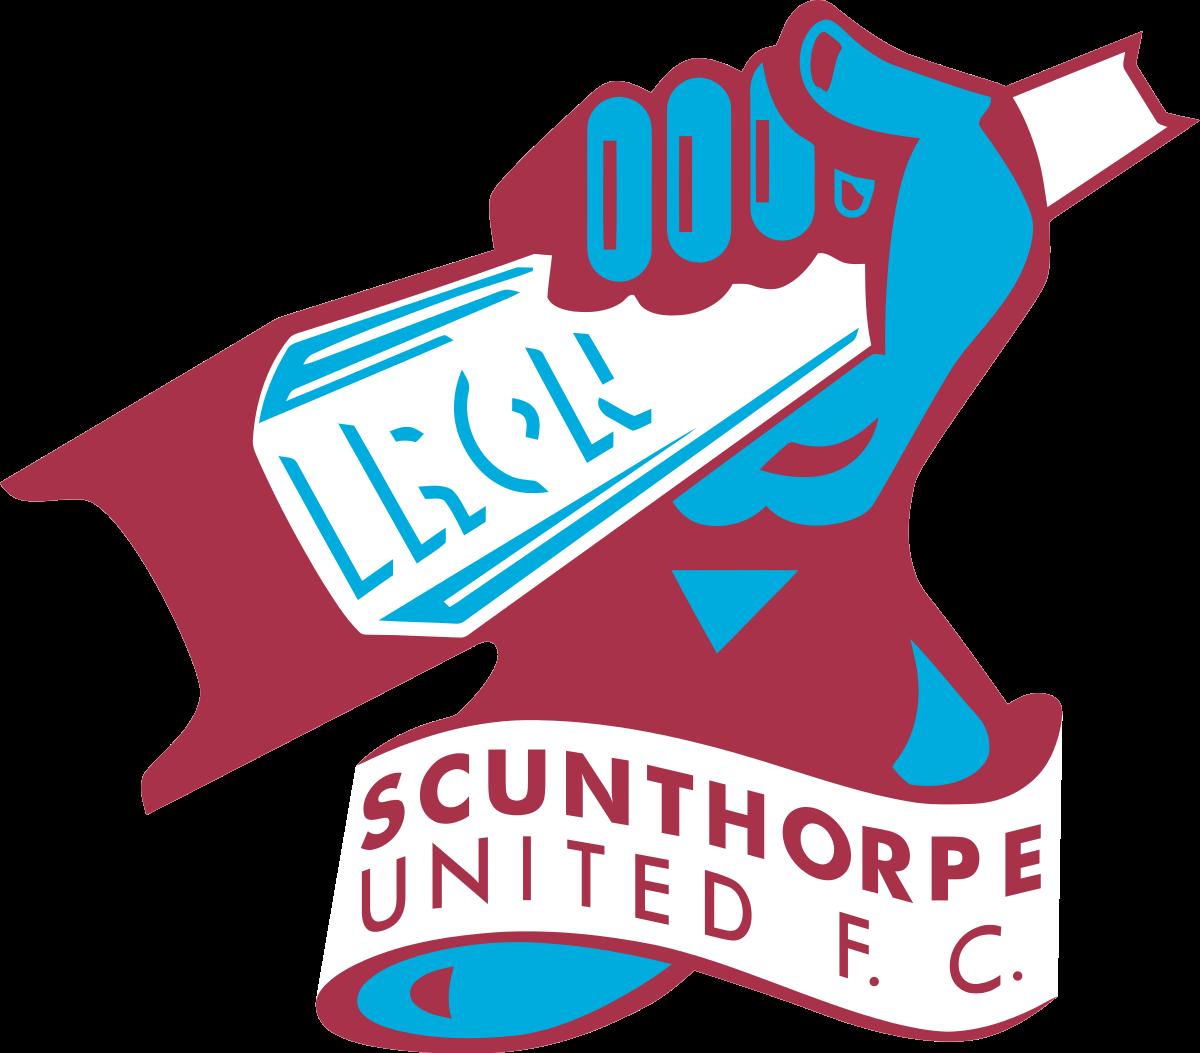 Scunthorpe United crest